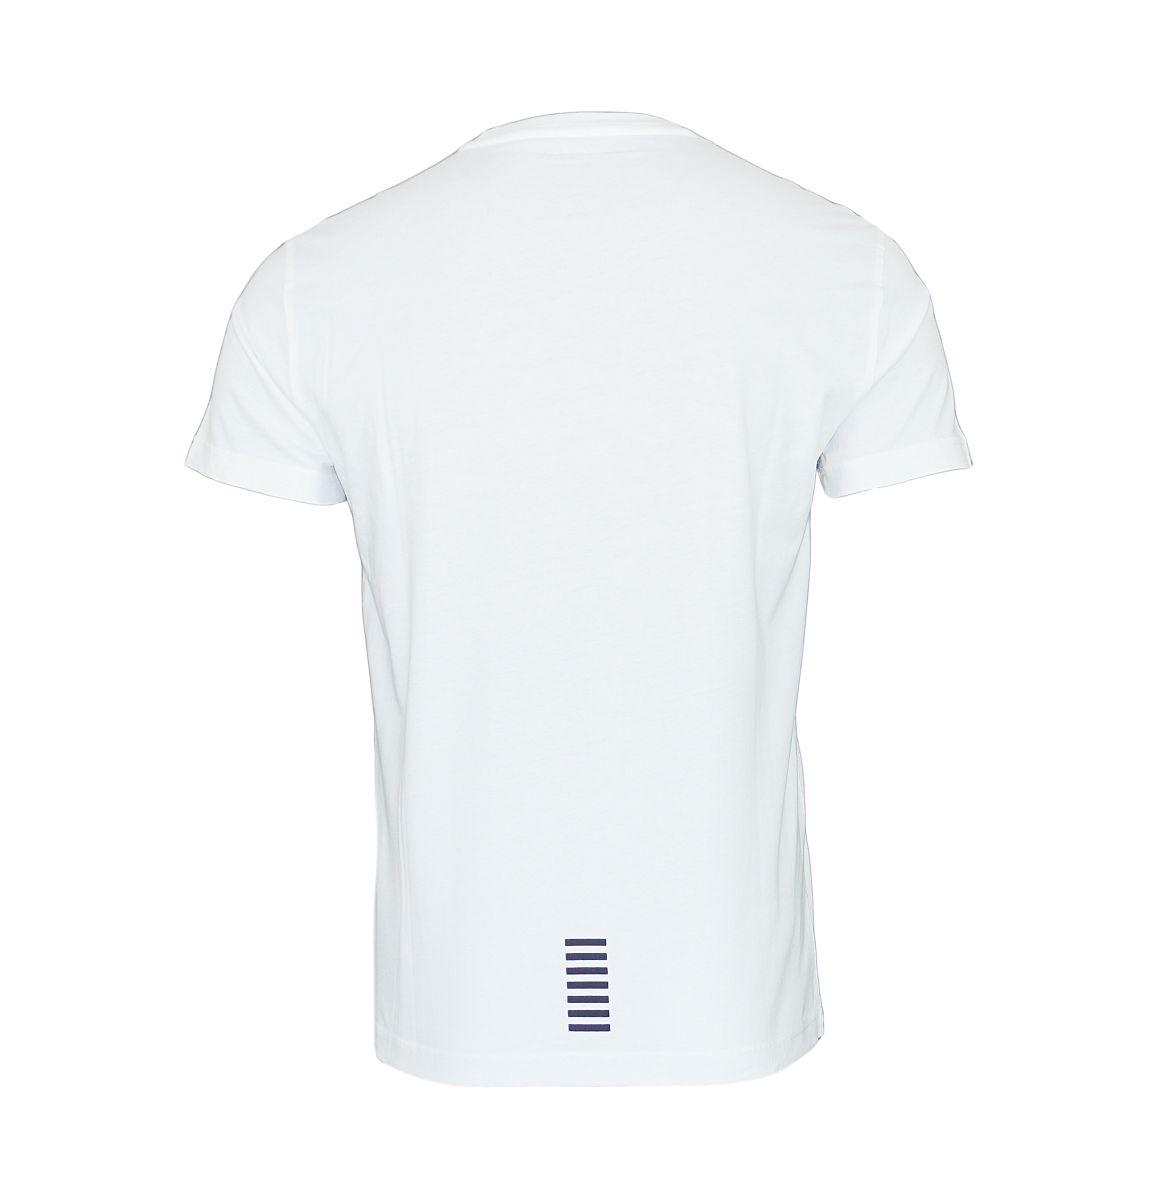 EA7 Emporio Armani Shirt T-Shirt 6YPT51 PJ30Z 1100 White HW17-EATS2